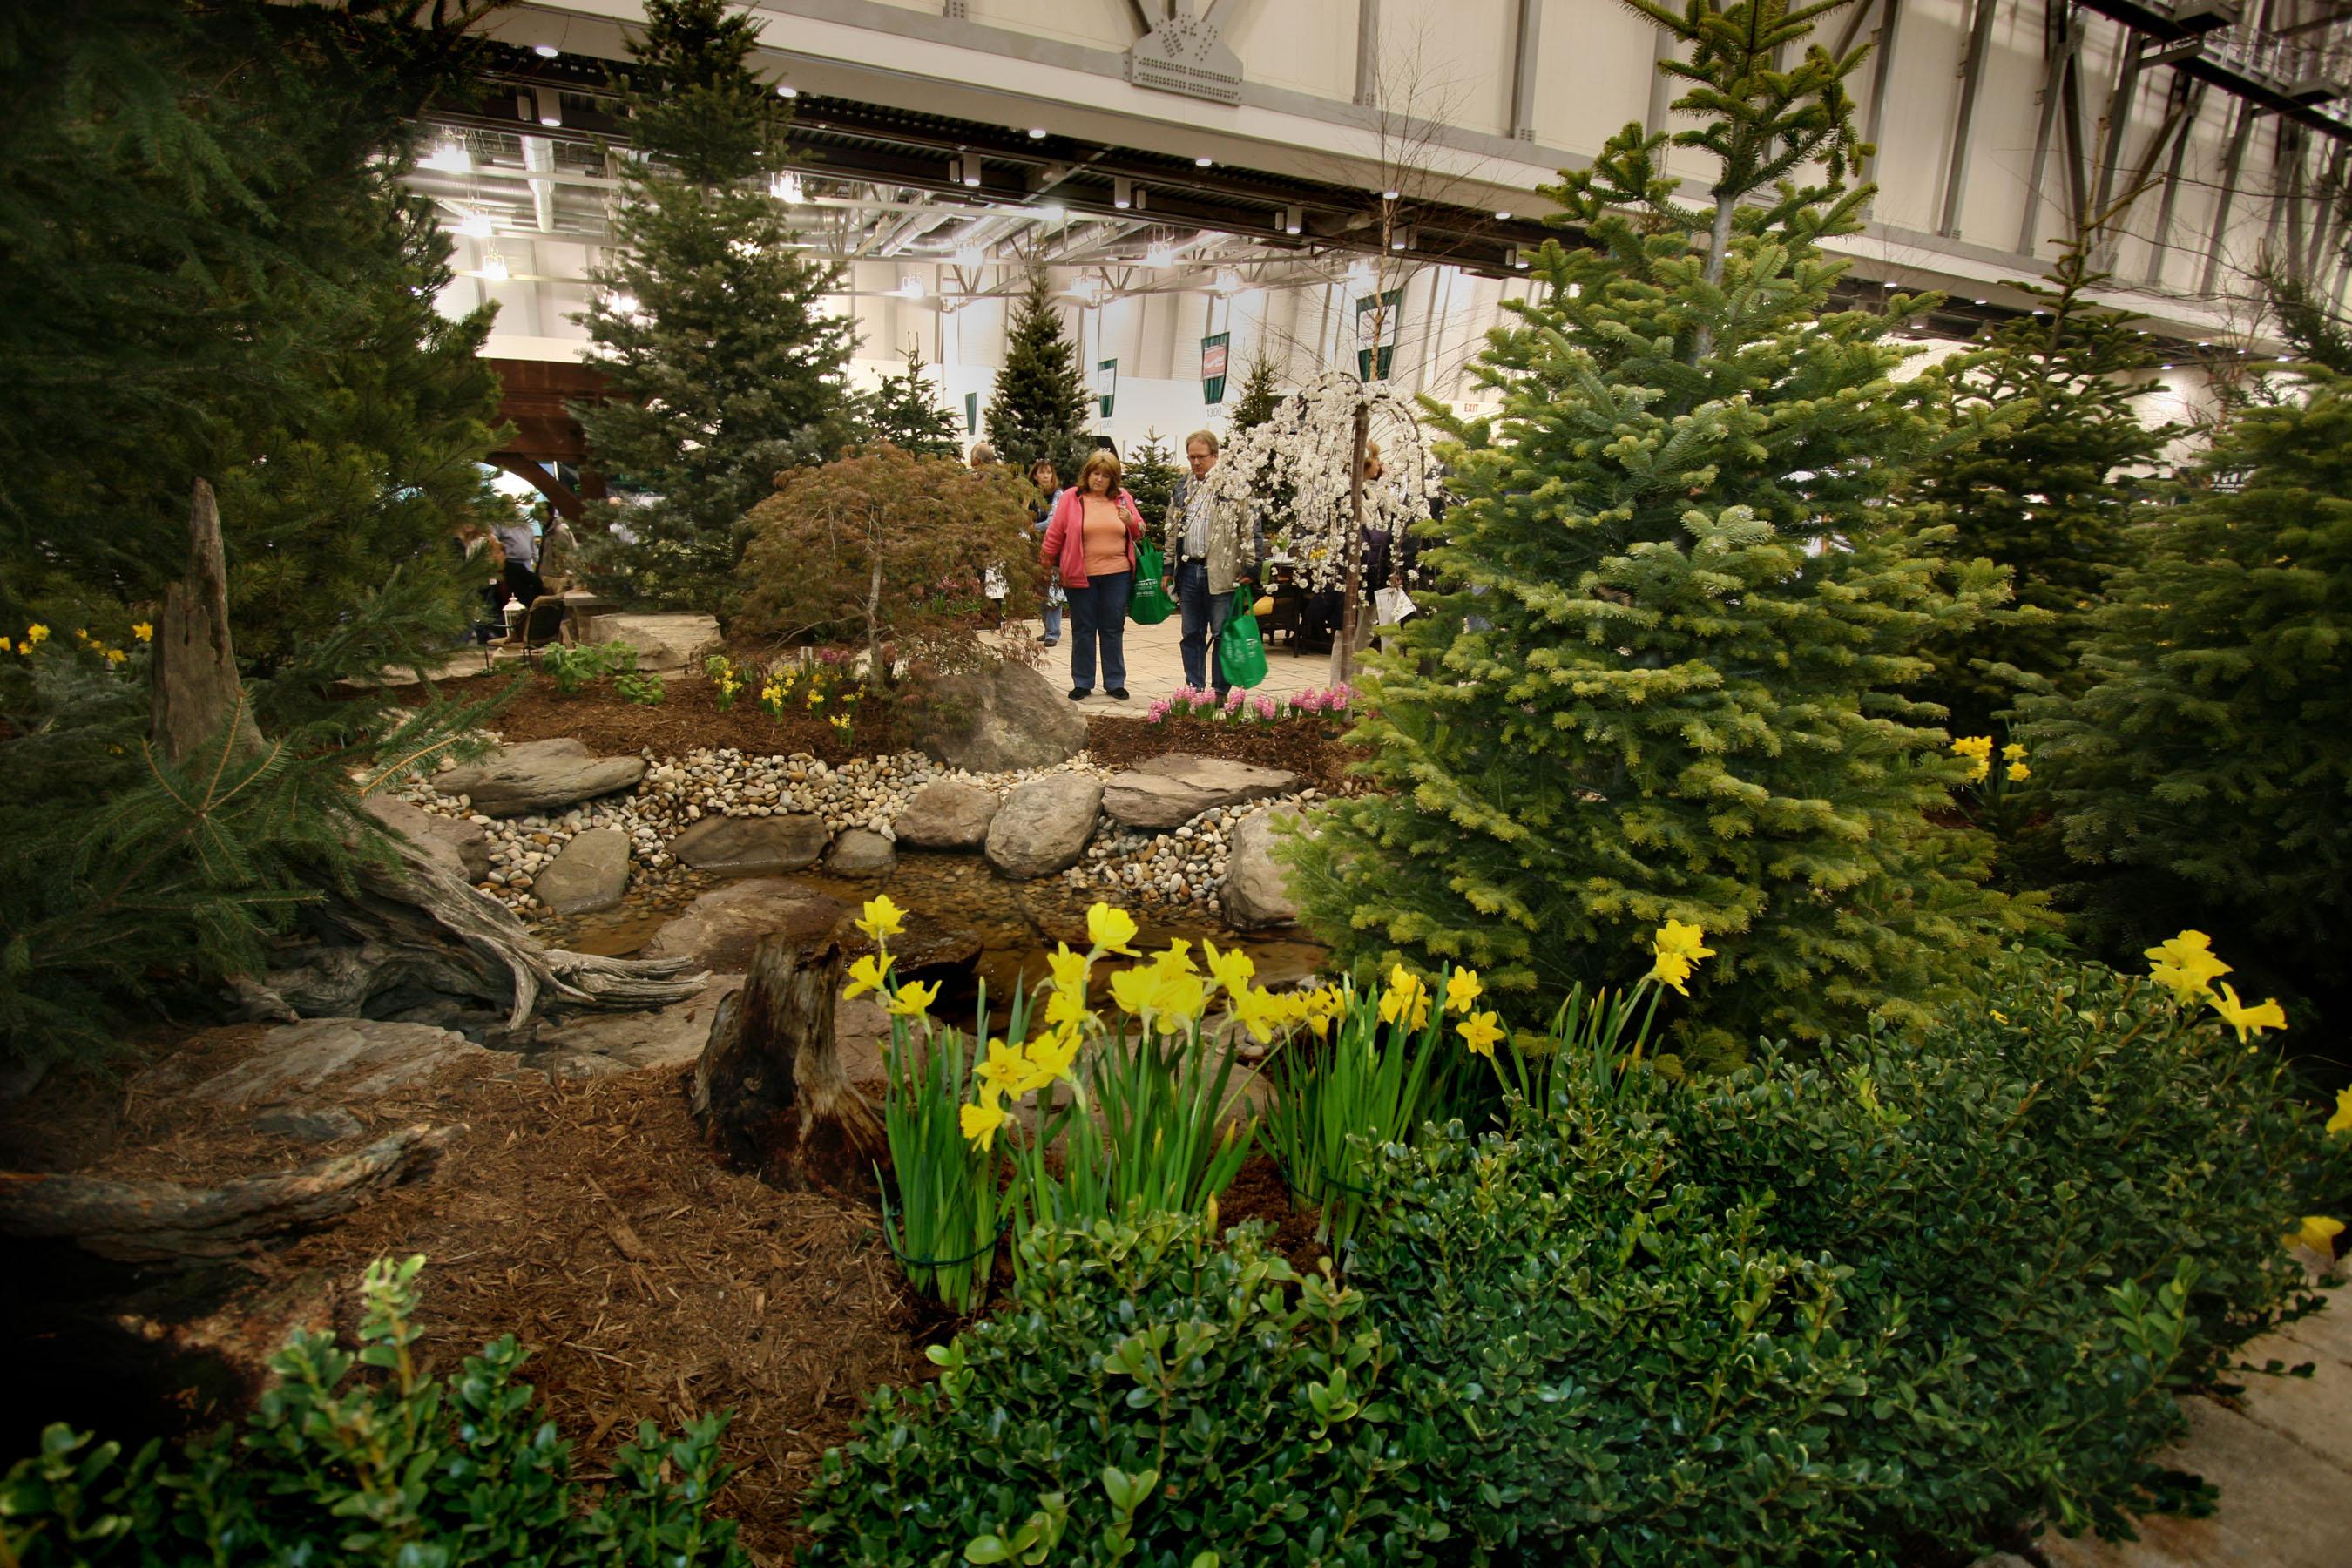 West michigan home garden show - Dallas home and garden show 2017 ...